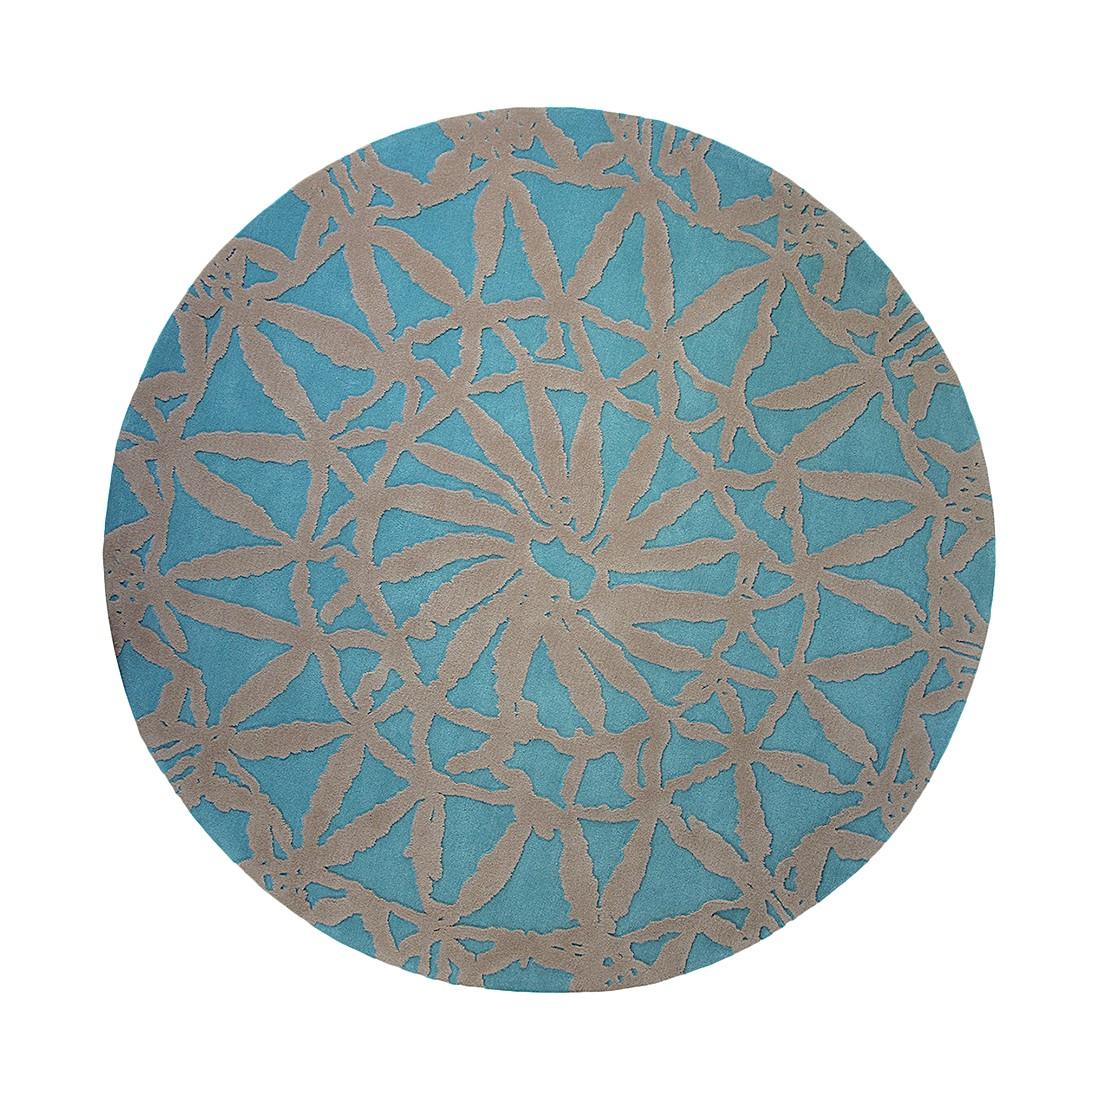 Tapijt Oriental Lounge - turquoise, Esprit Home